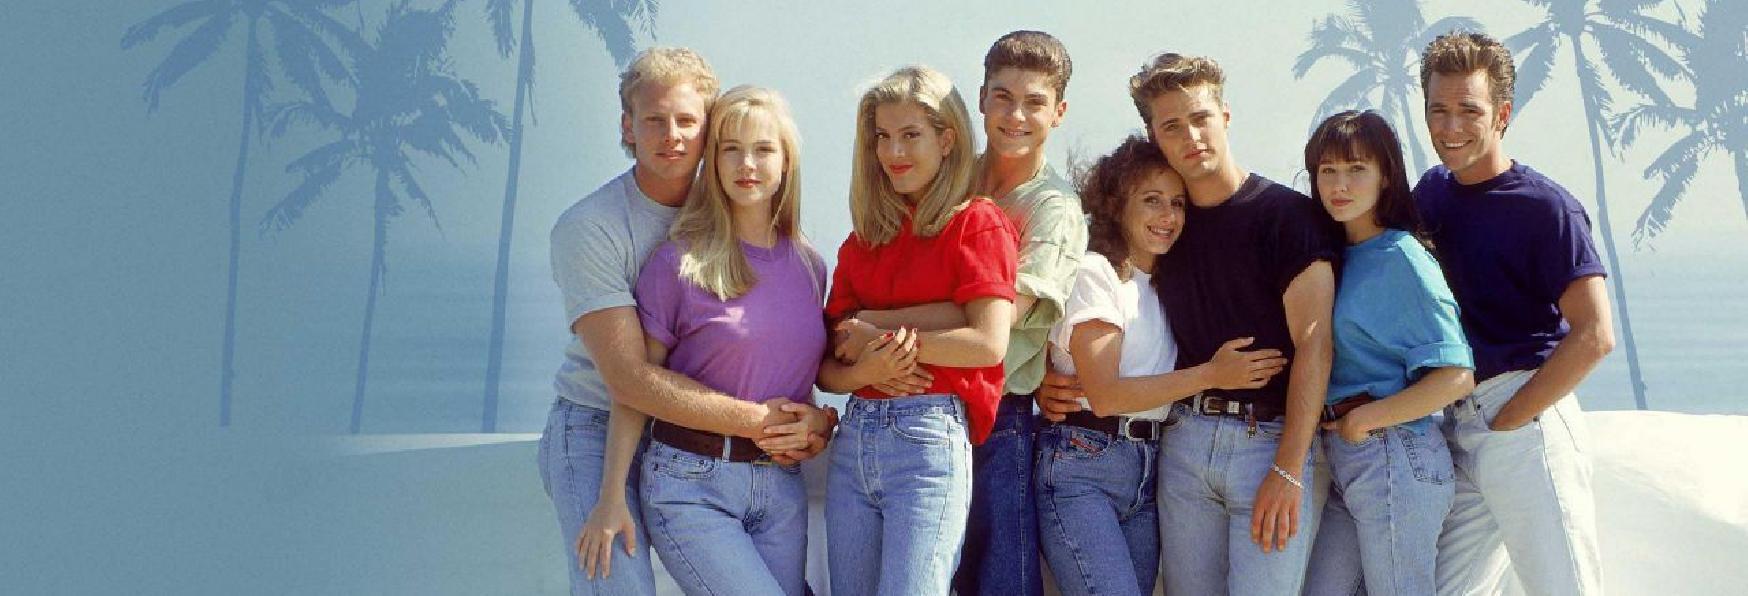 Beverly Hills, 90210: il Nuovo Teaser Trailer dell'atteso Revival